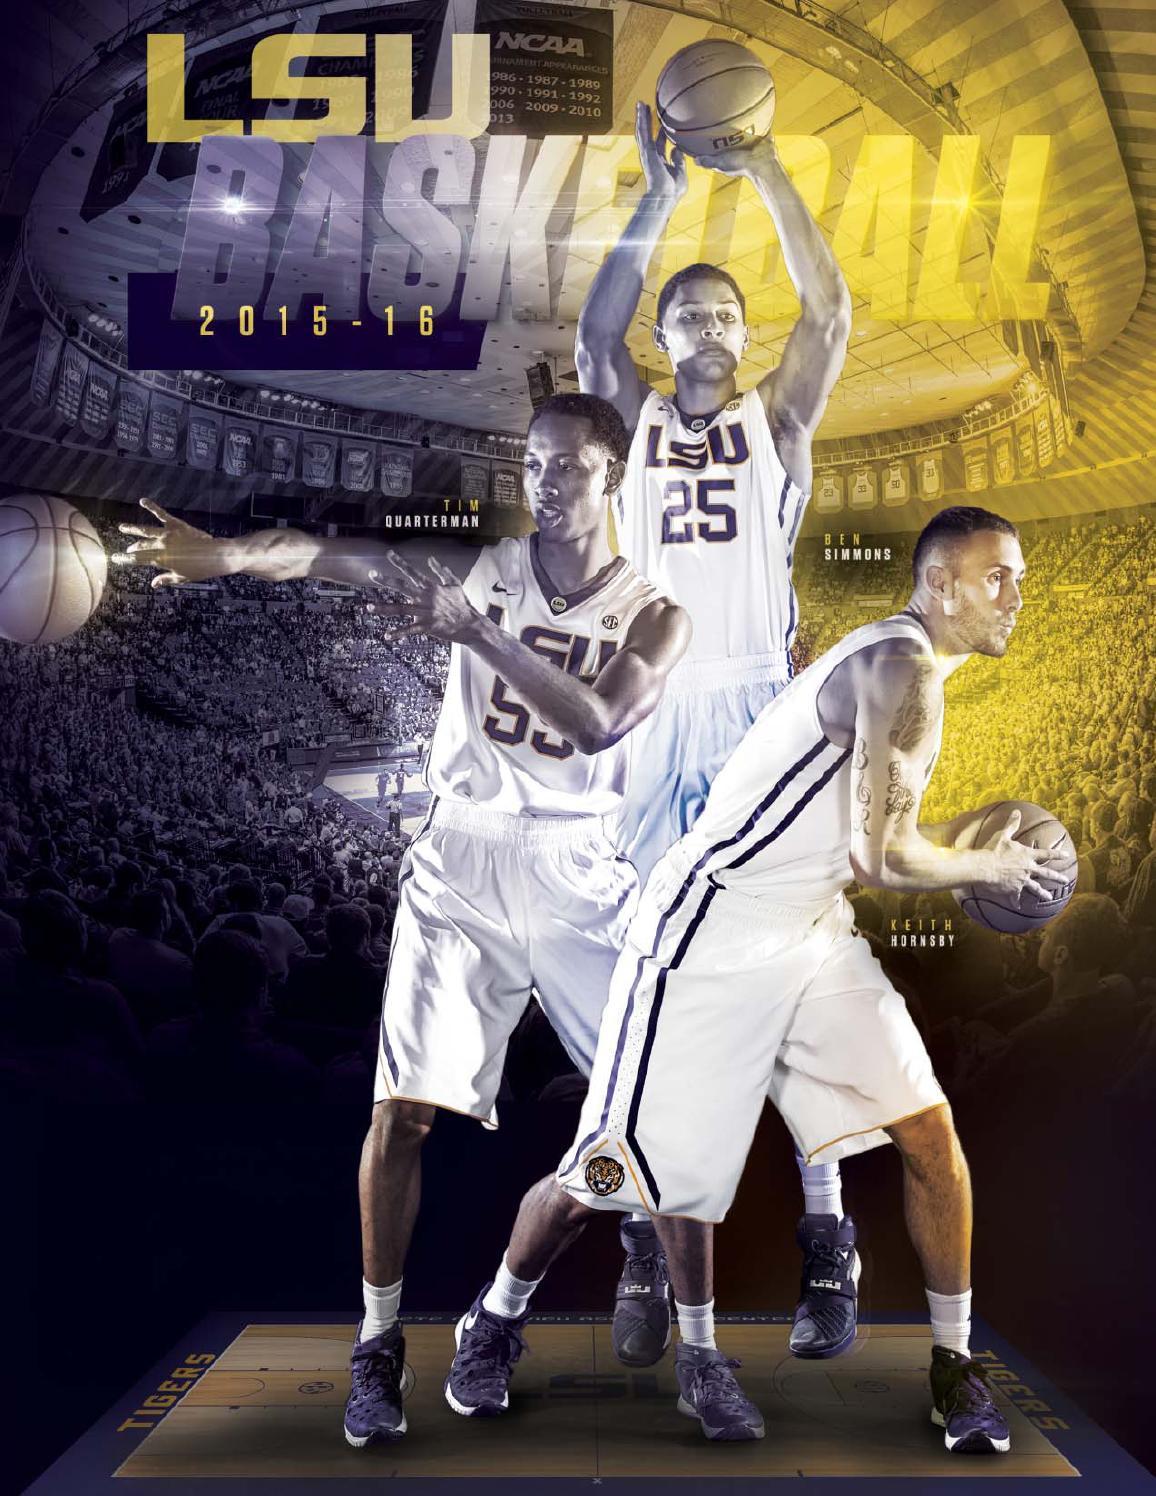 2b2c4d5bc0e4 2015-16 LSU Men s Basketball Media Guide by LSU Athletics - issuu